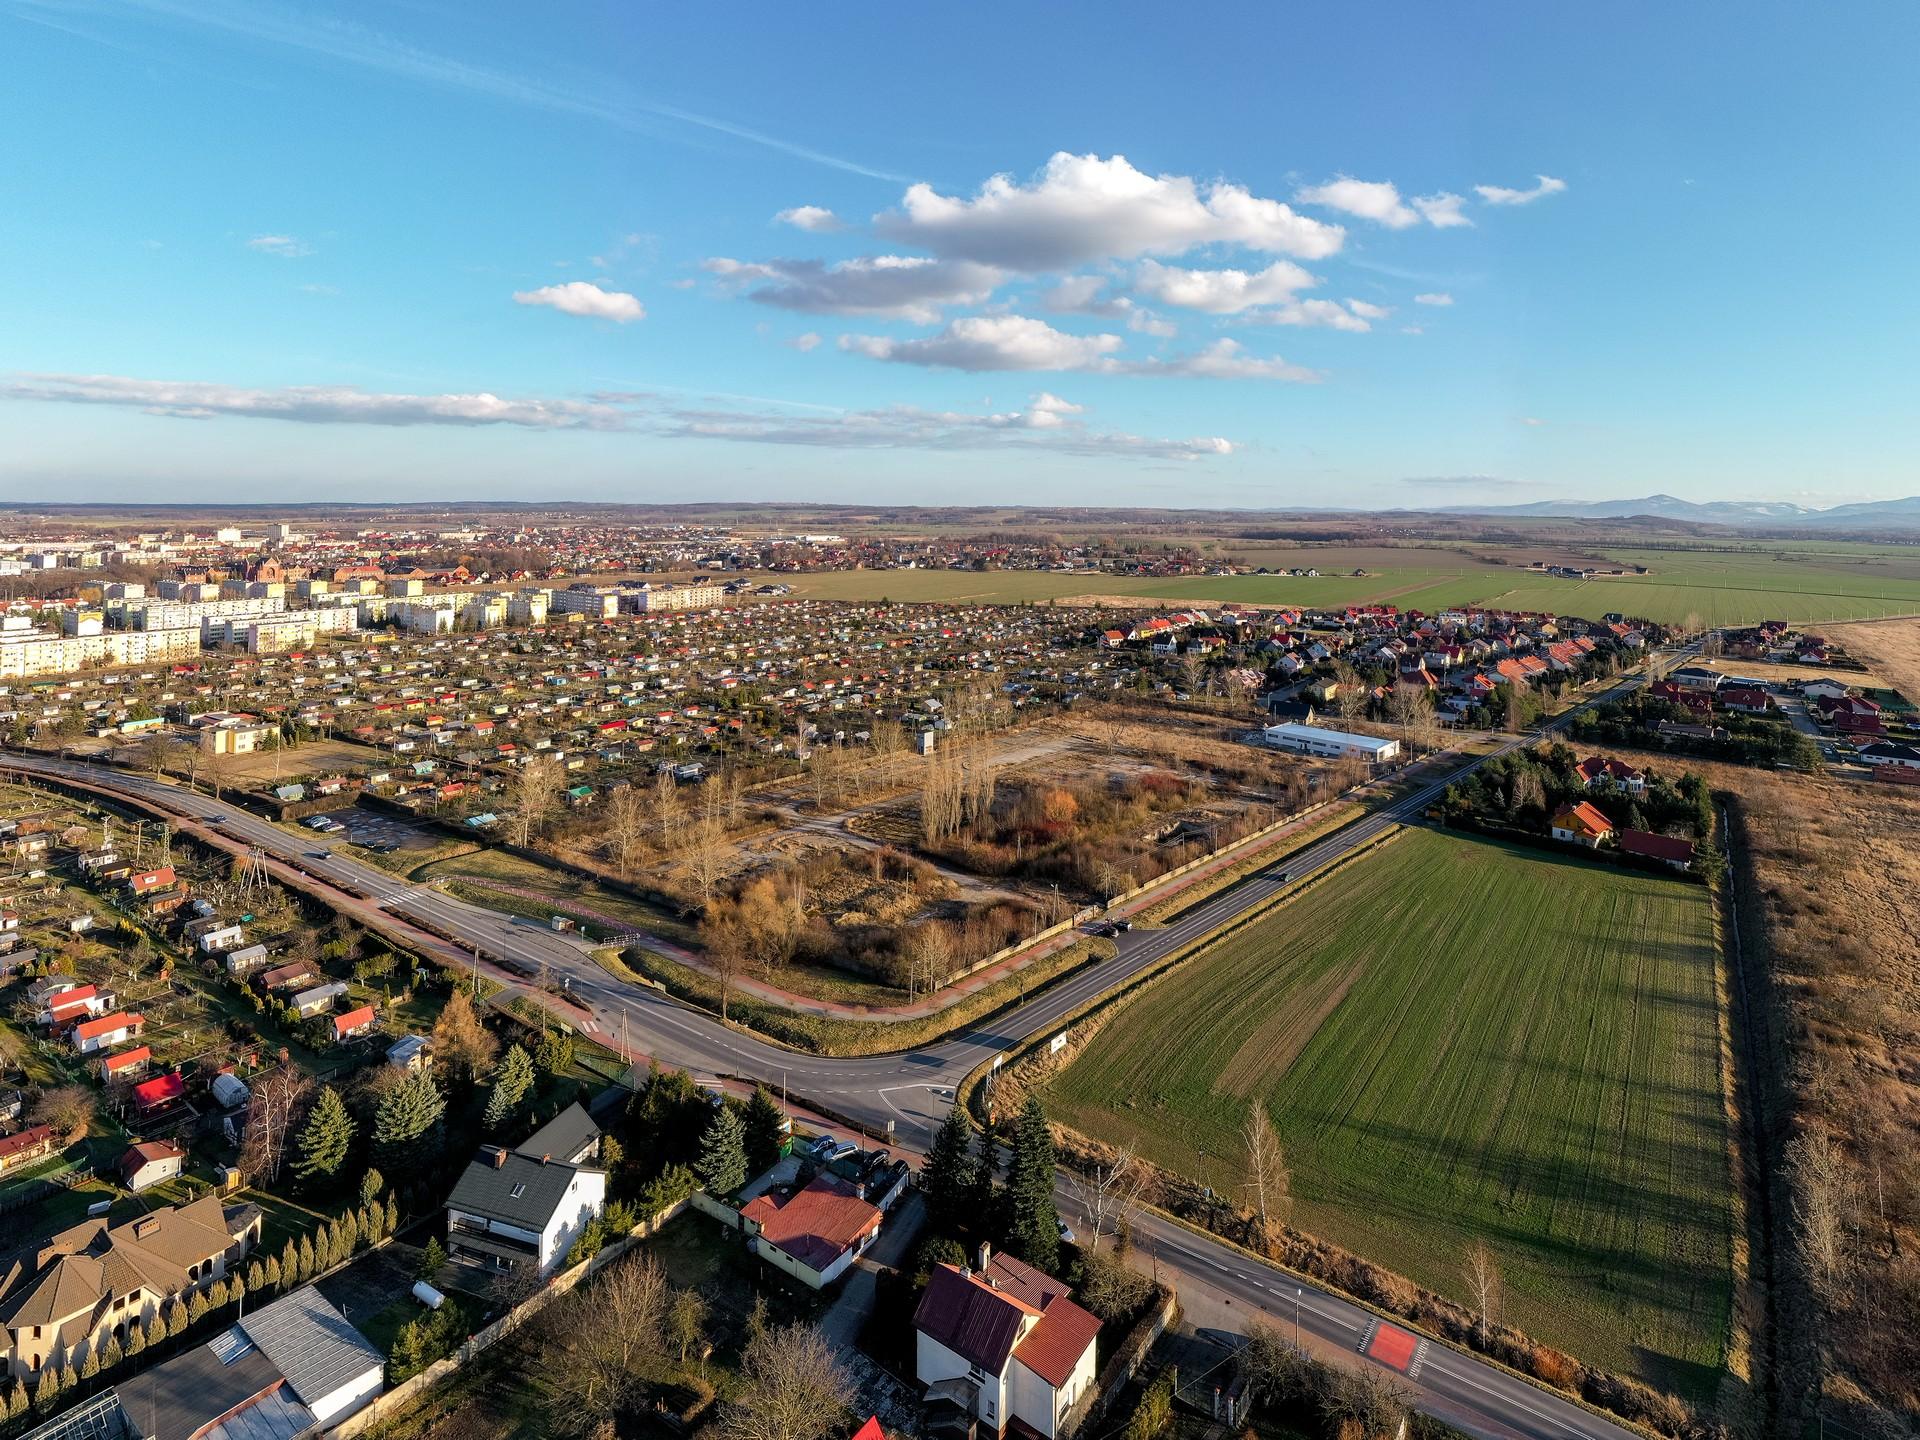 Belweder Park Nysa Zdjecia z Drona 20.02.2020 1